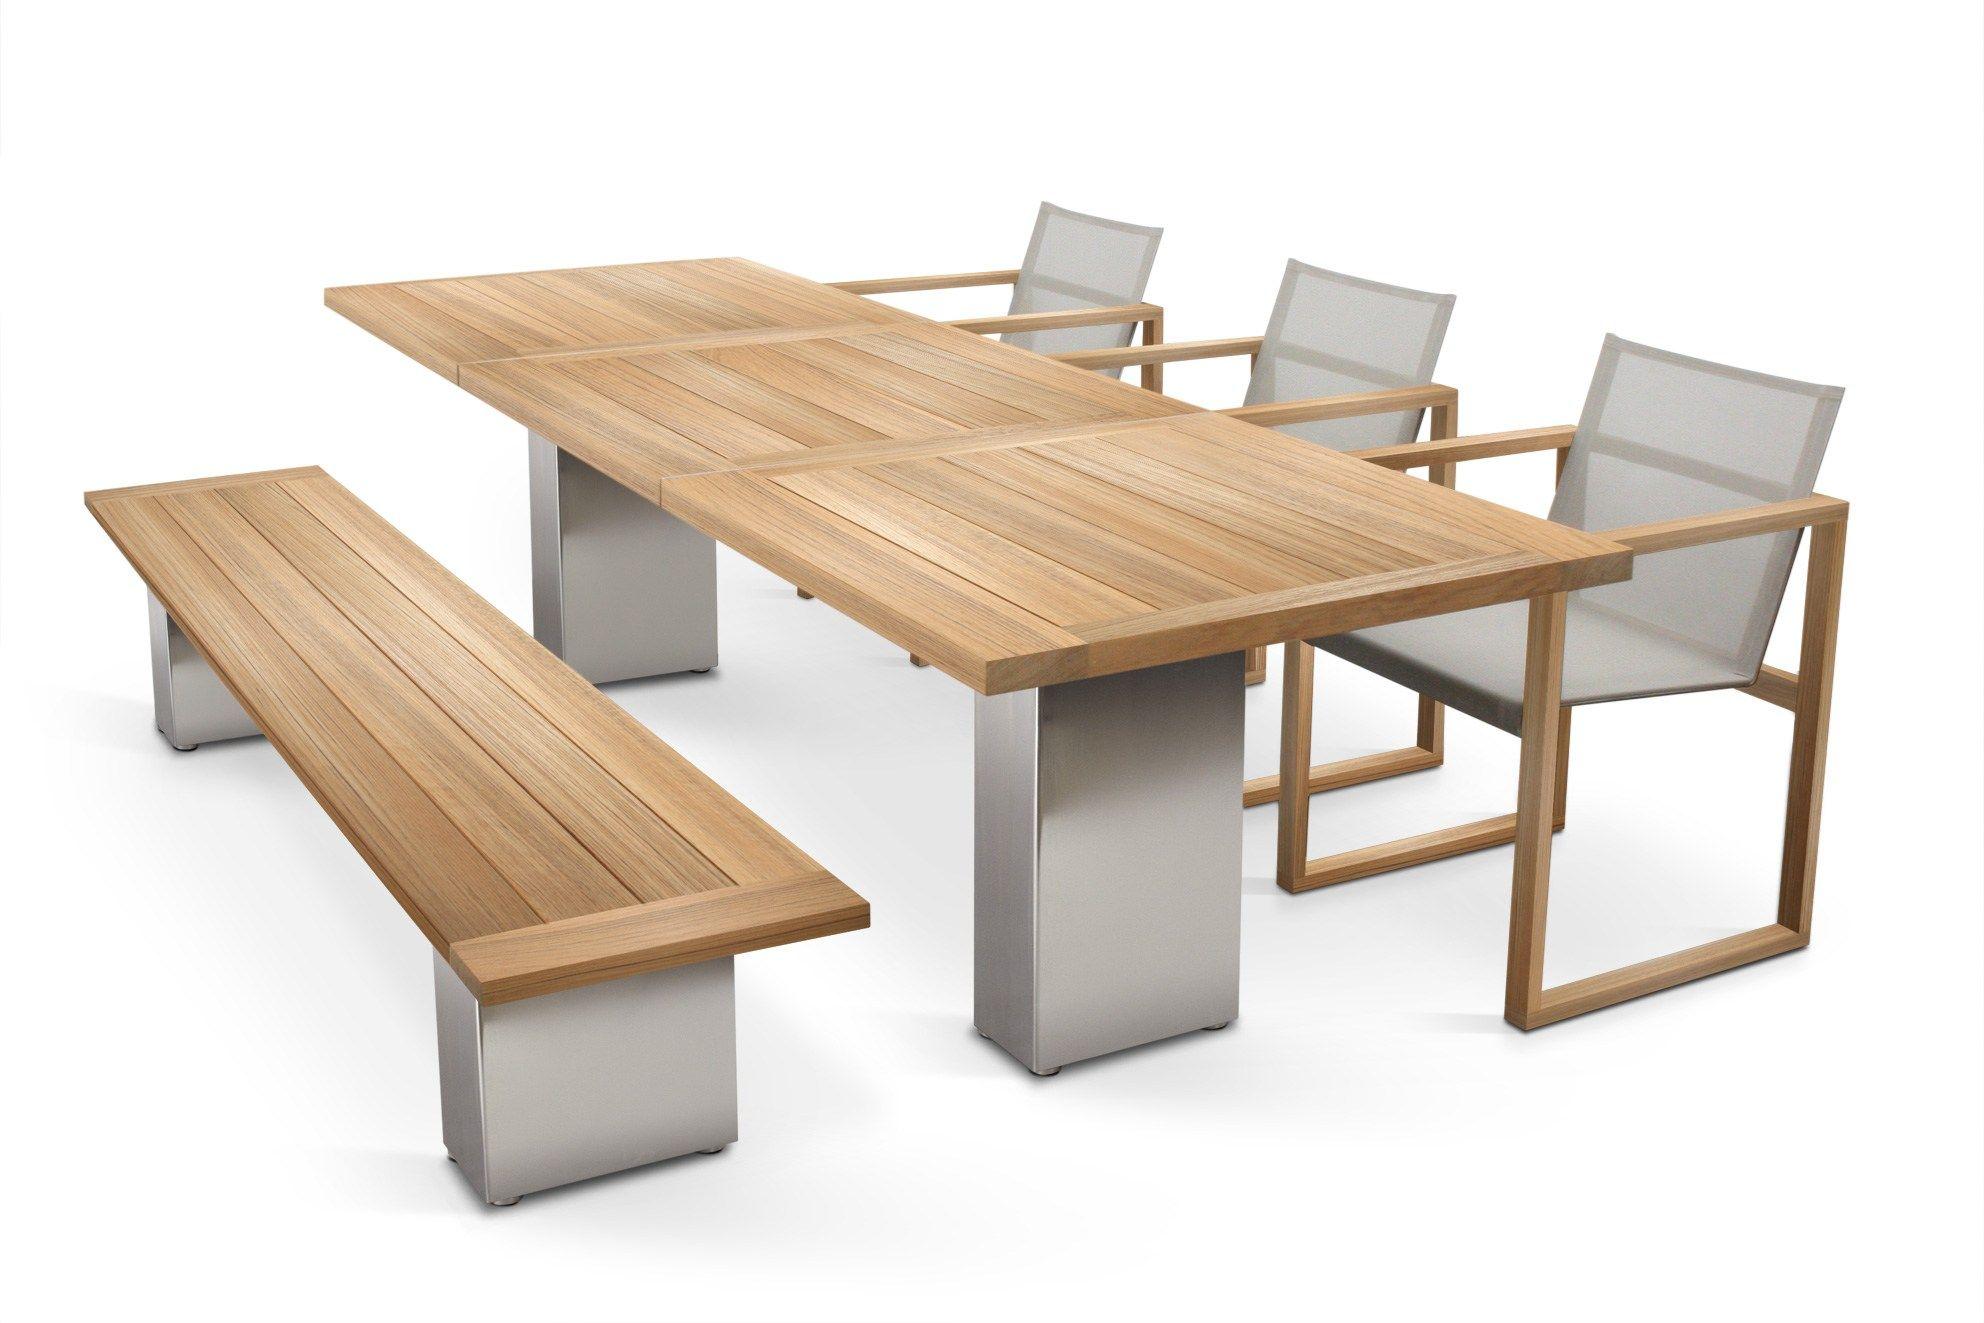 Doble mesa de teca by fueradentro dise o hendrik steenbakkers - Mesa de teca ...